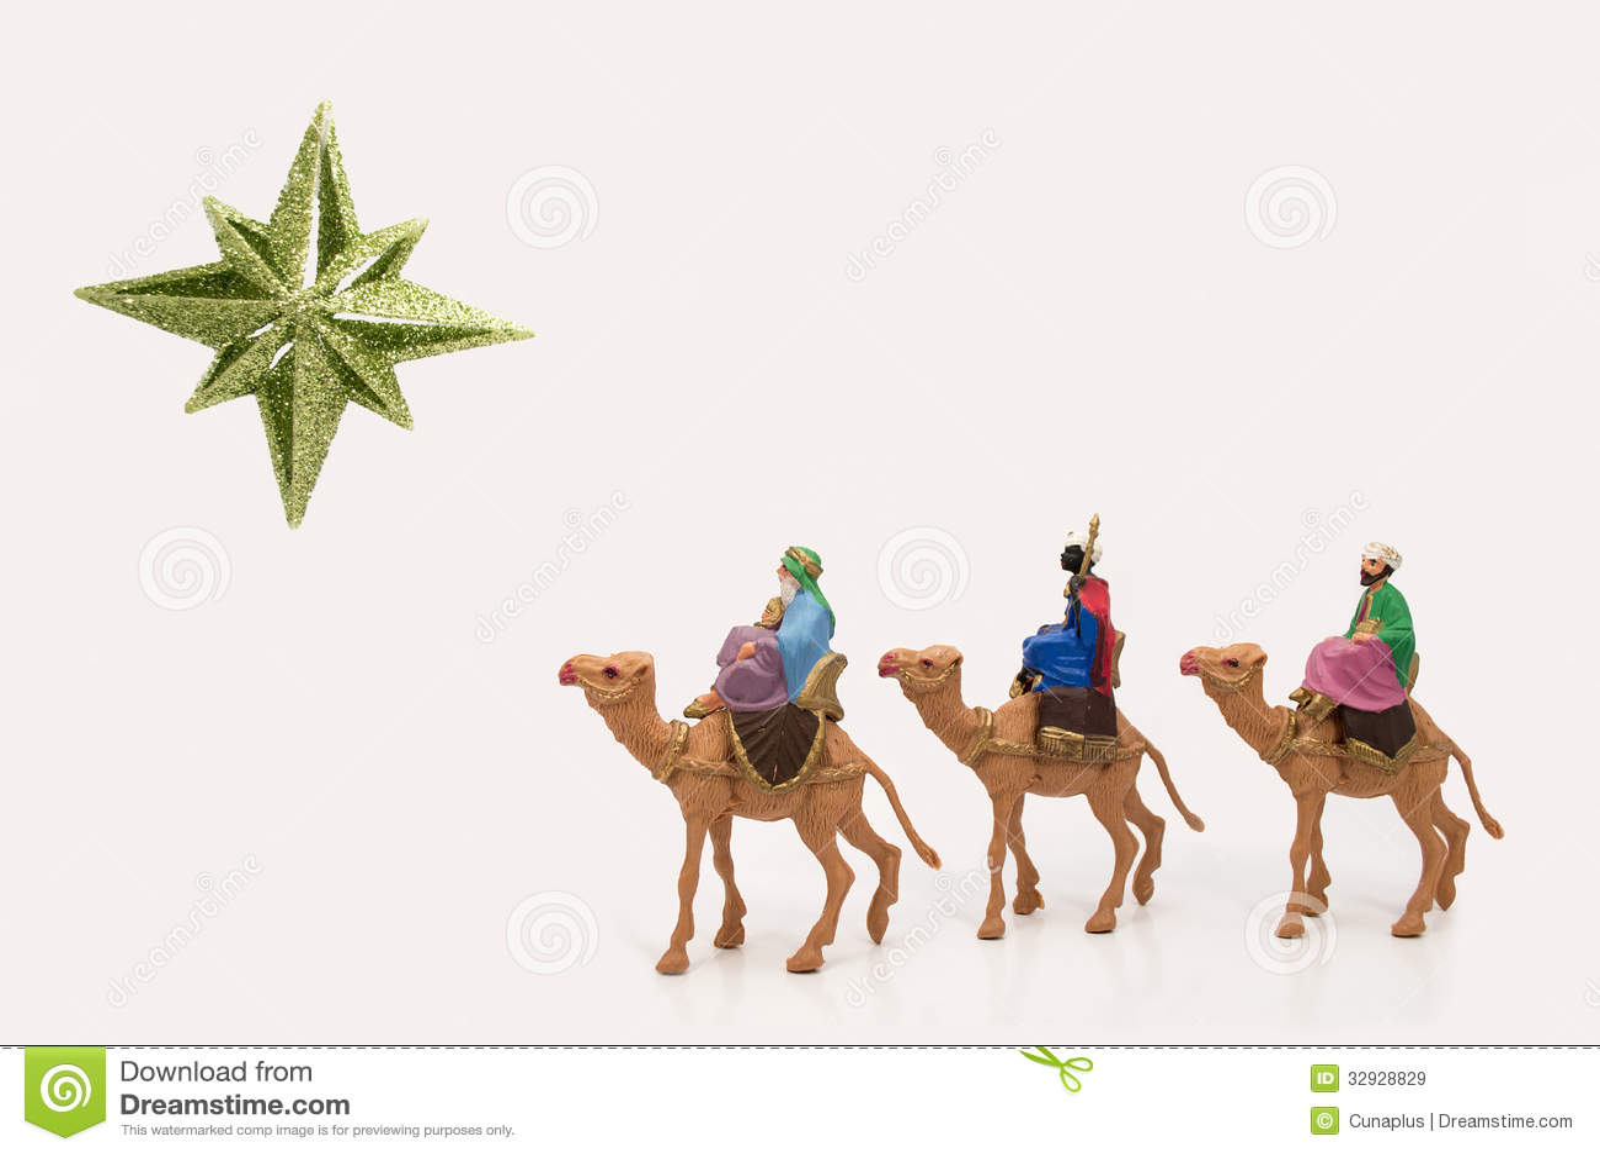 Wisemen following the star of bethlehem clip art